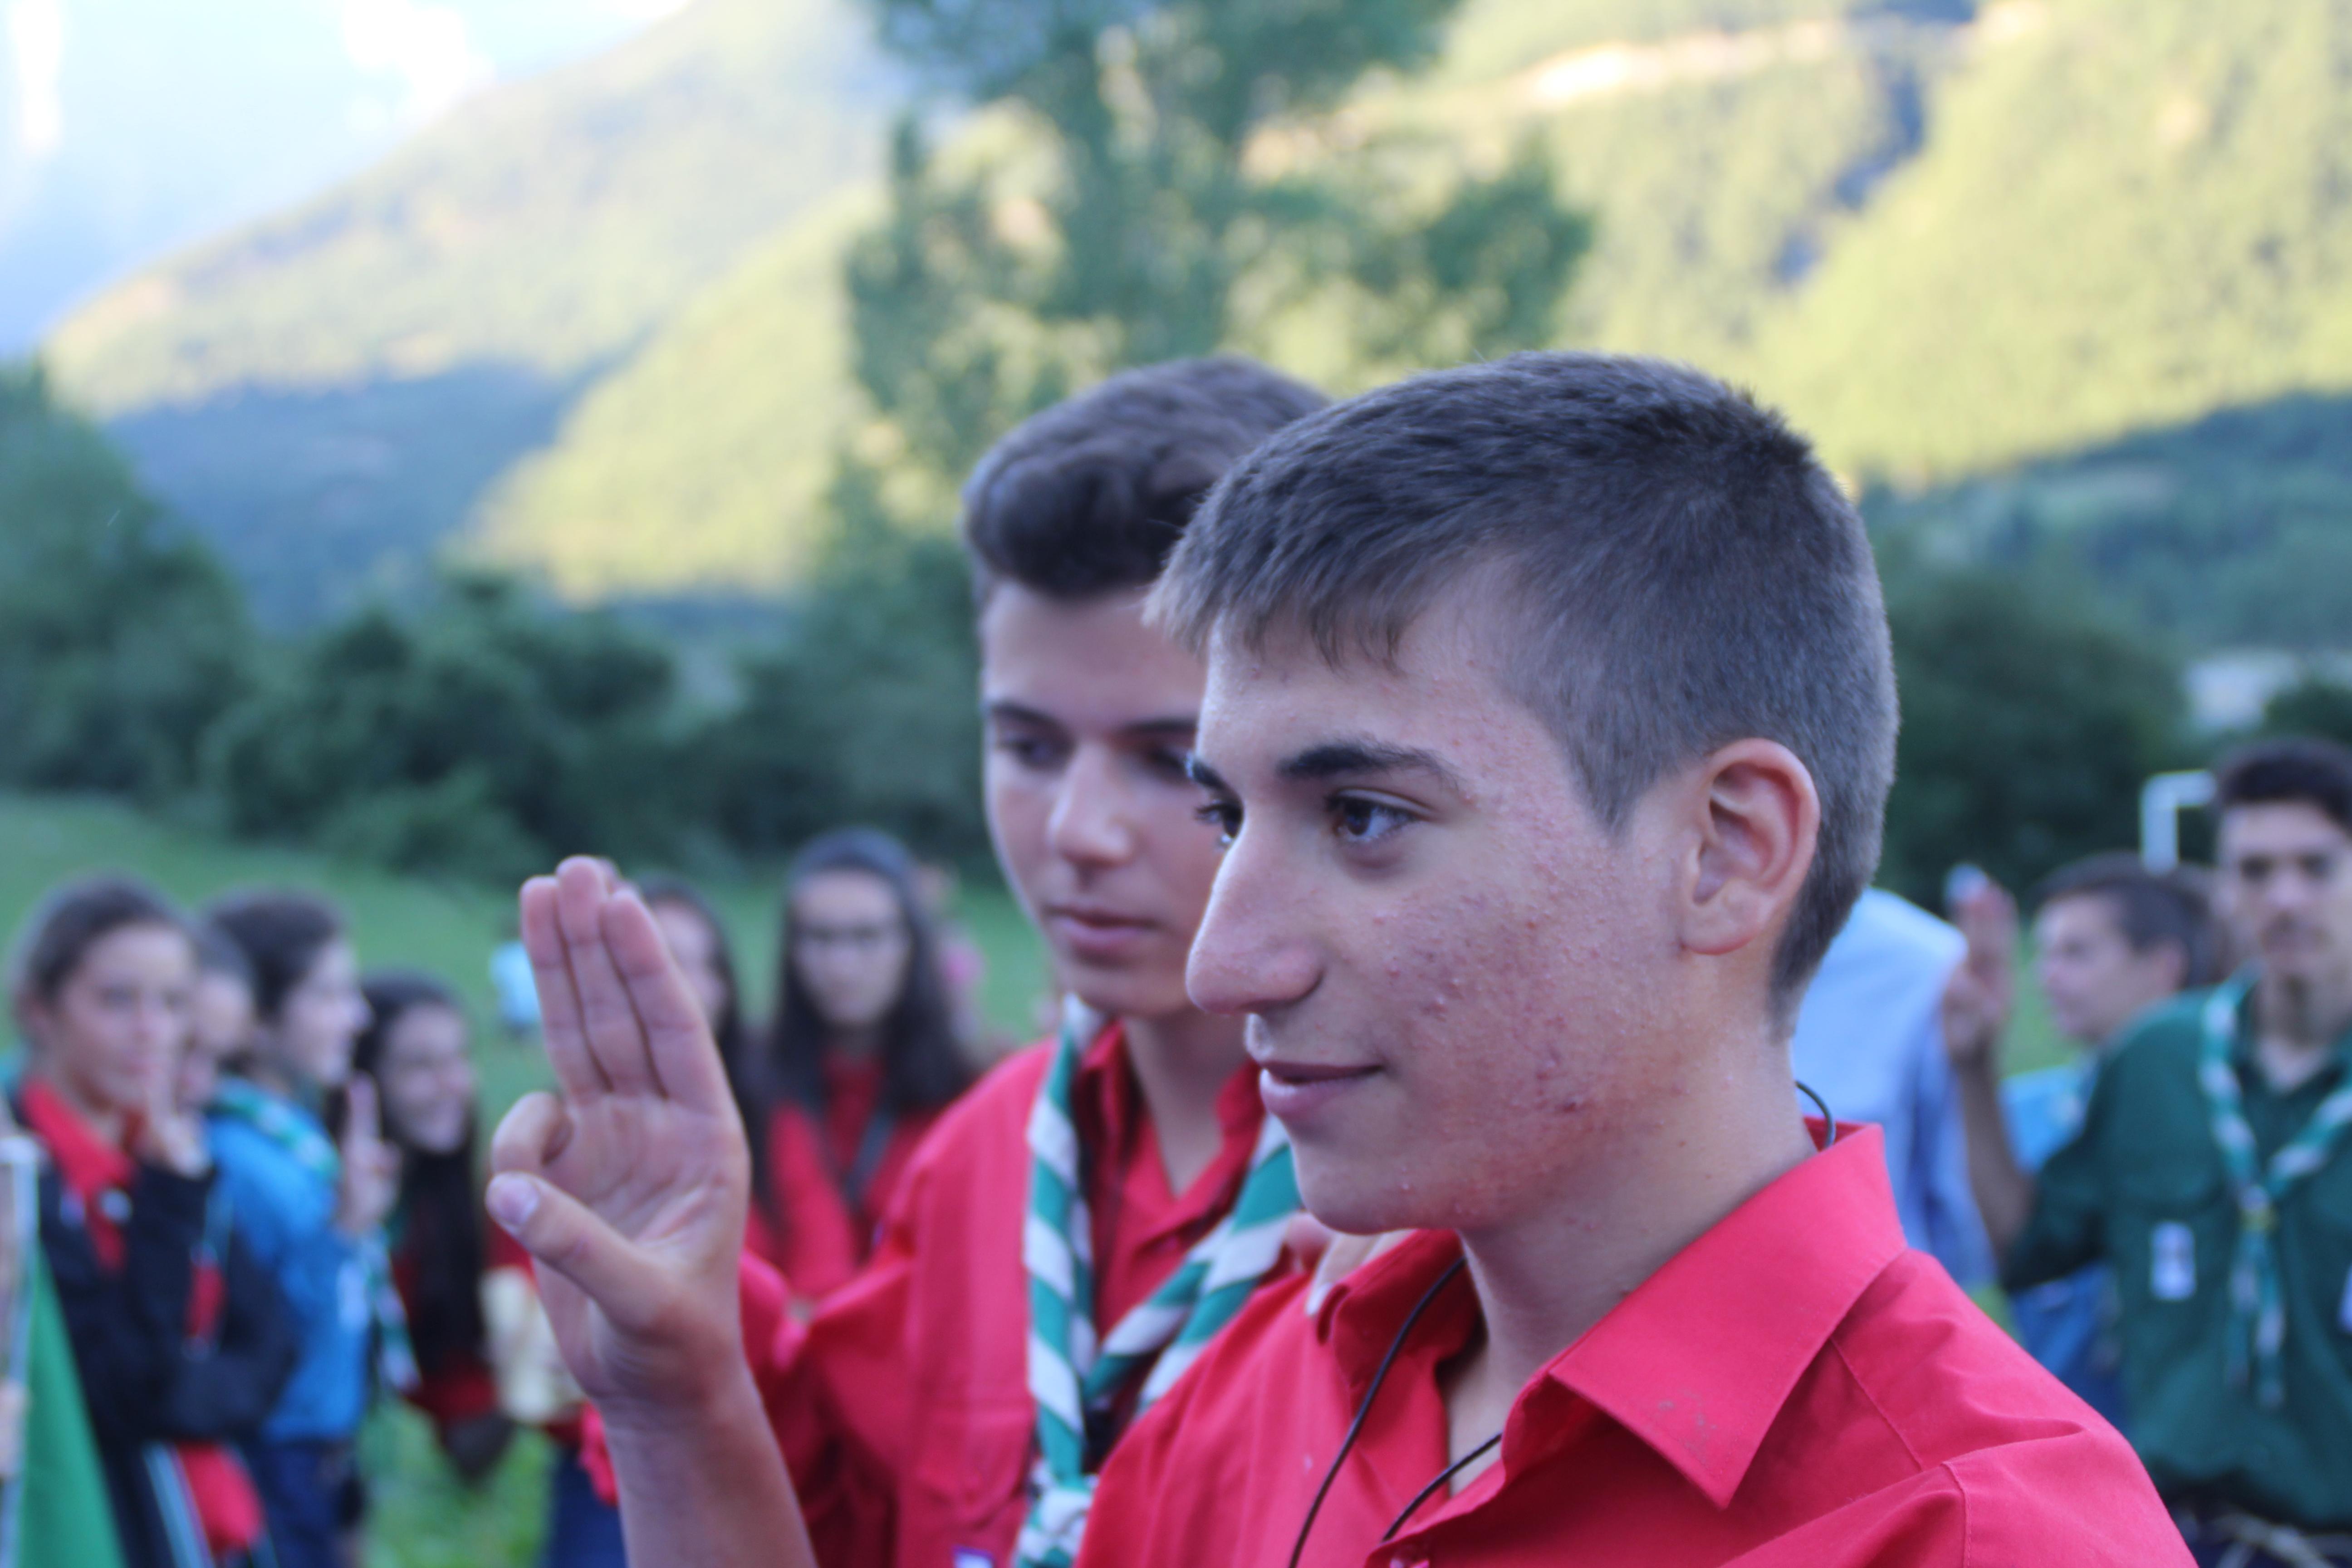 15-16 - Grupo - Campamento de verano - P365